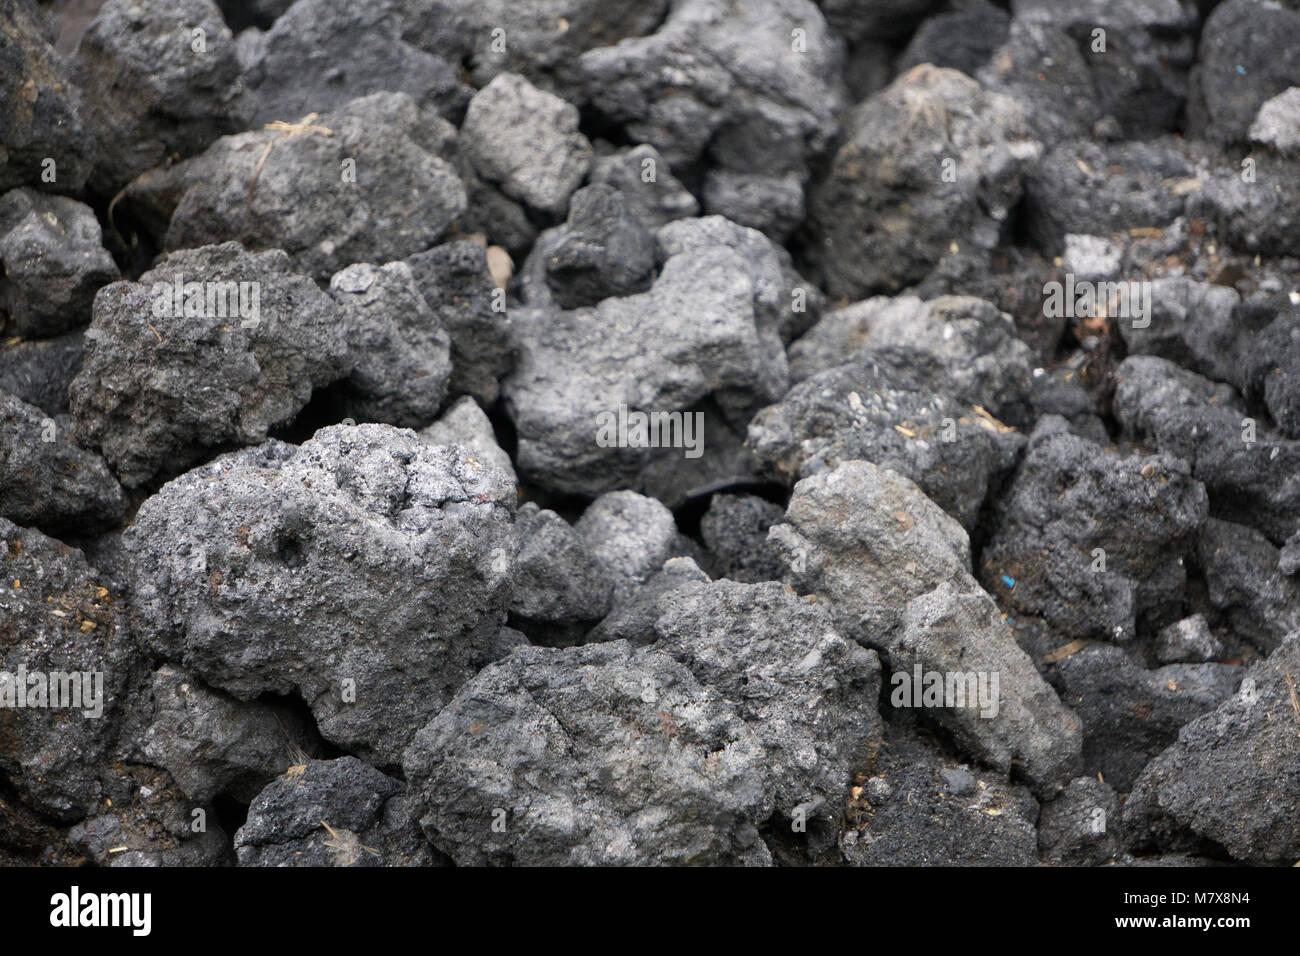 Coal Slag Rock : Burnt stones stock photos images alamy